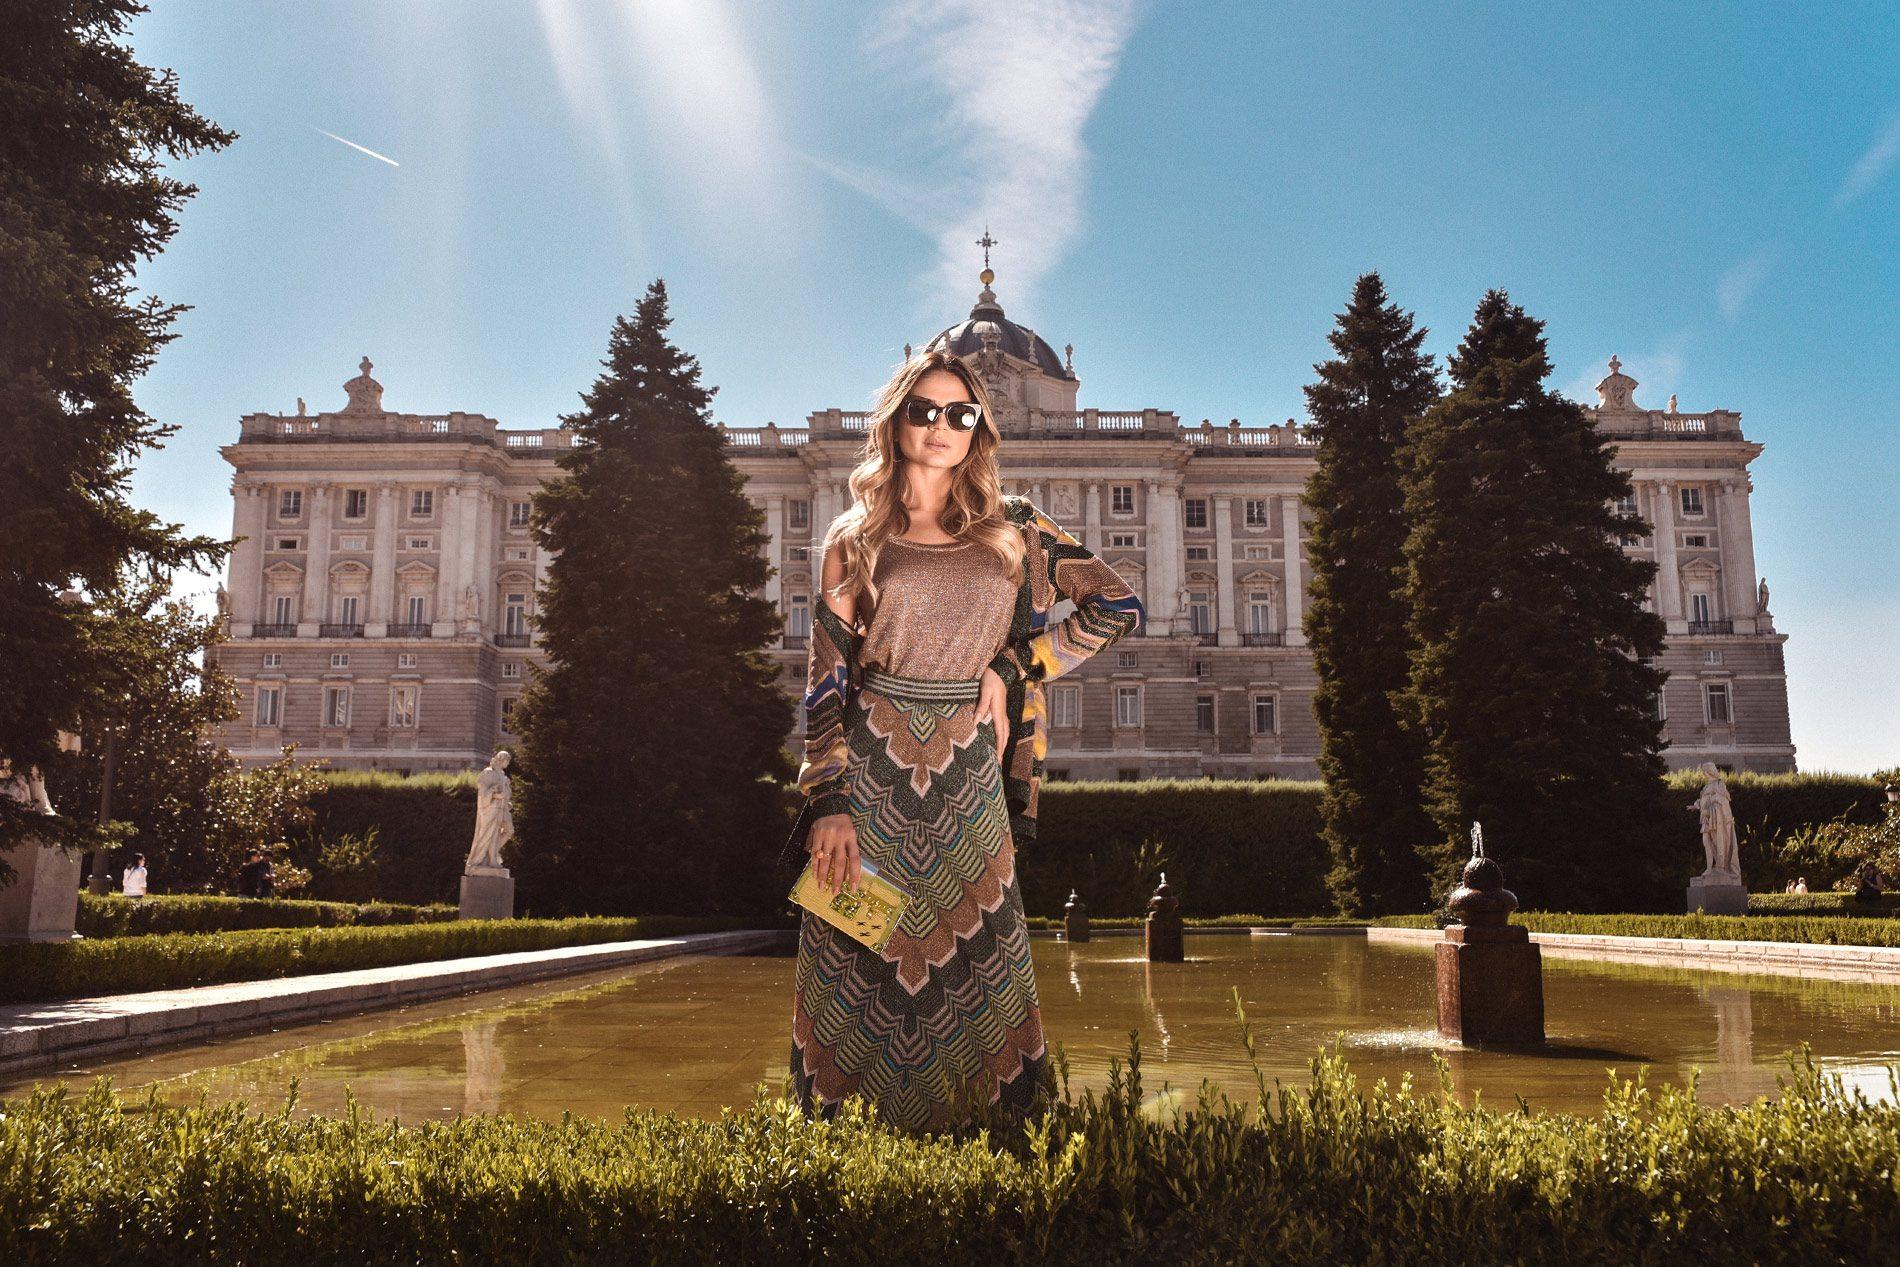 El Corte Inglés Madrid Spain Thassia Naves Missoni Louis Vuitton